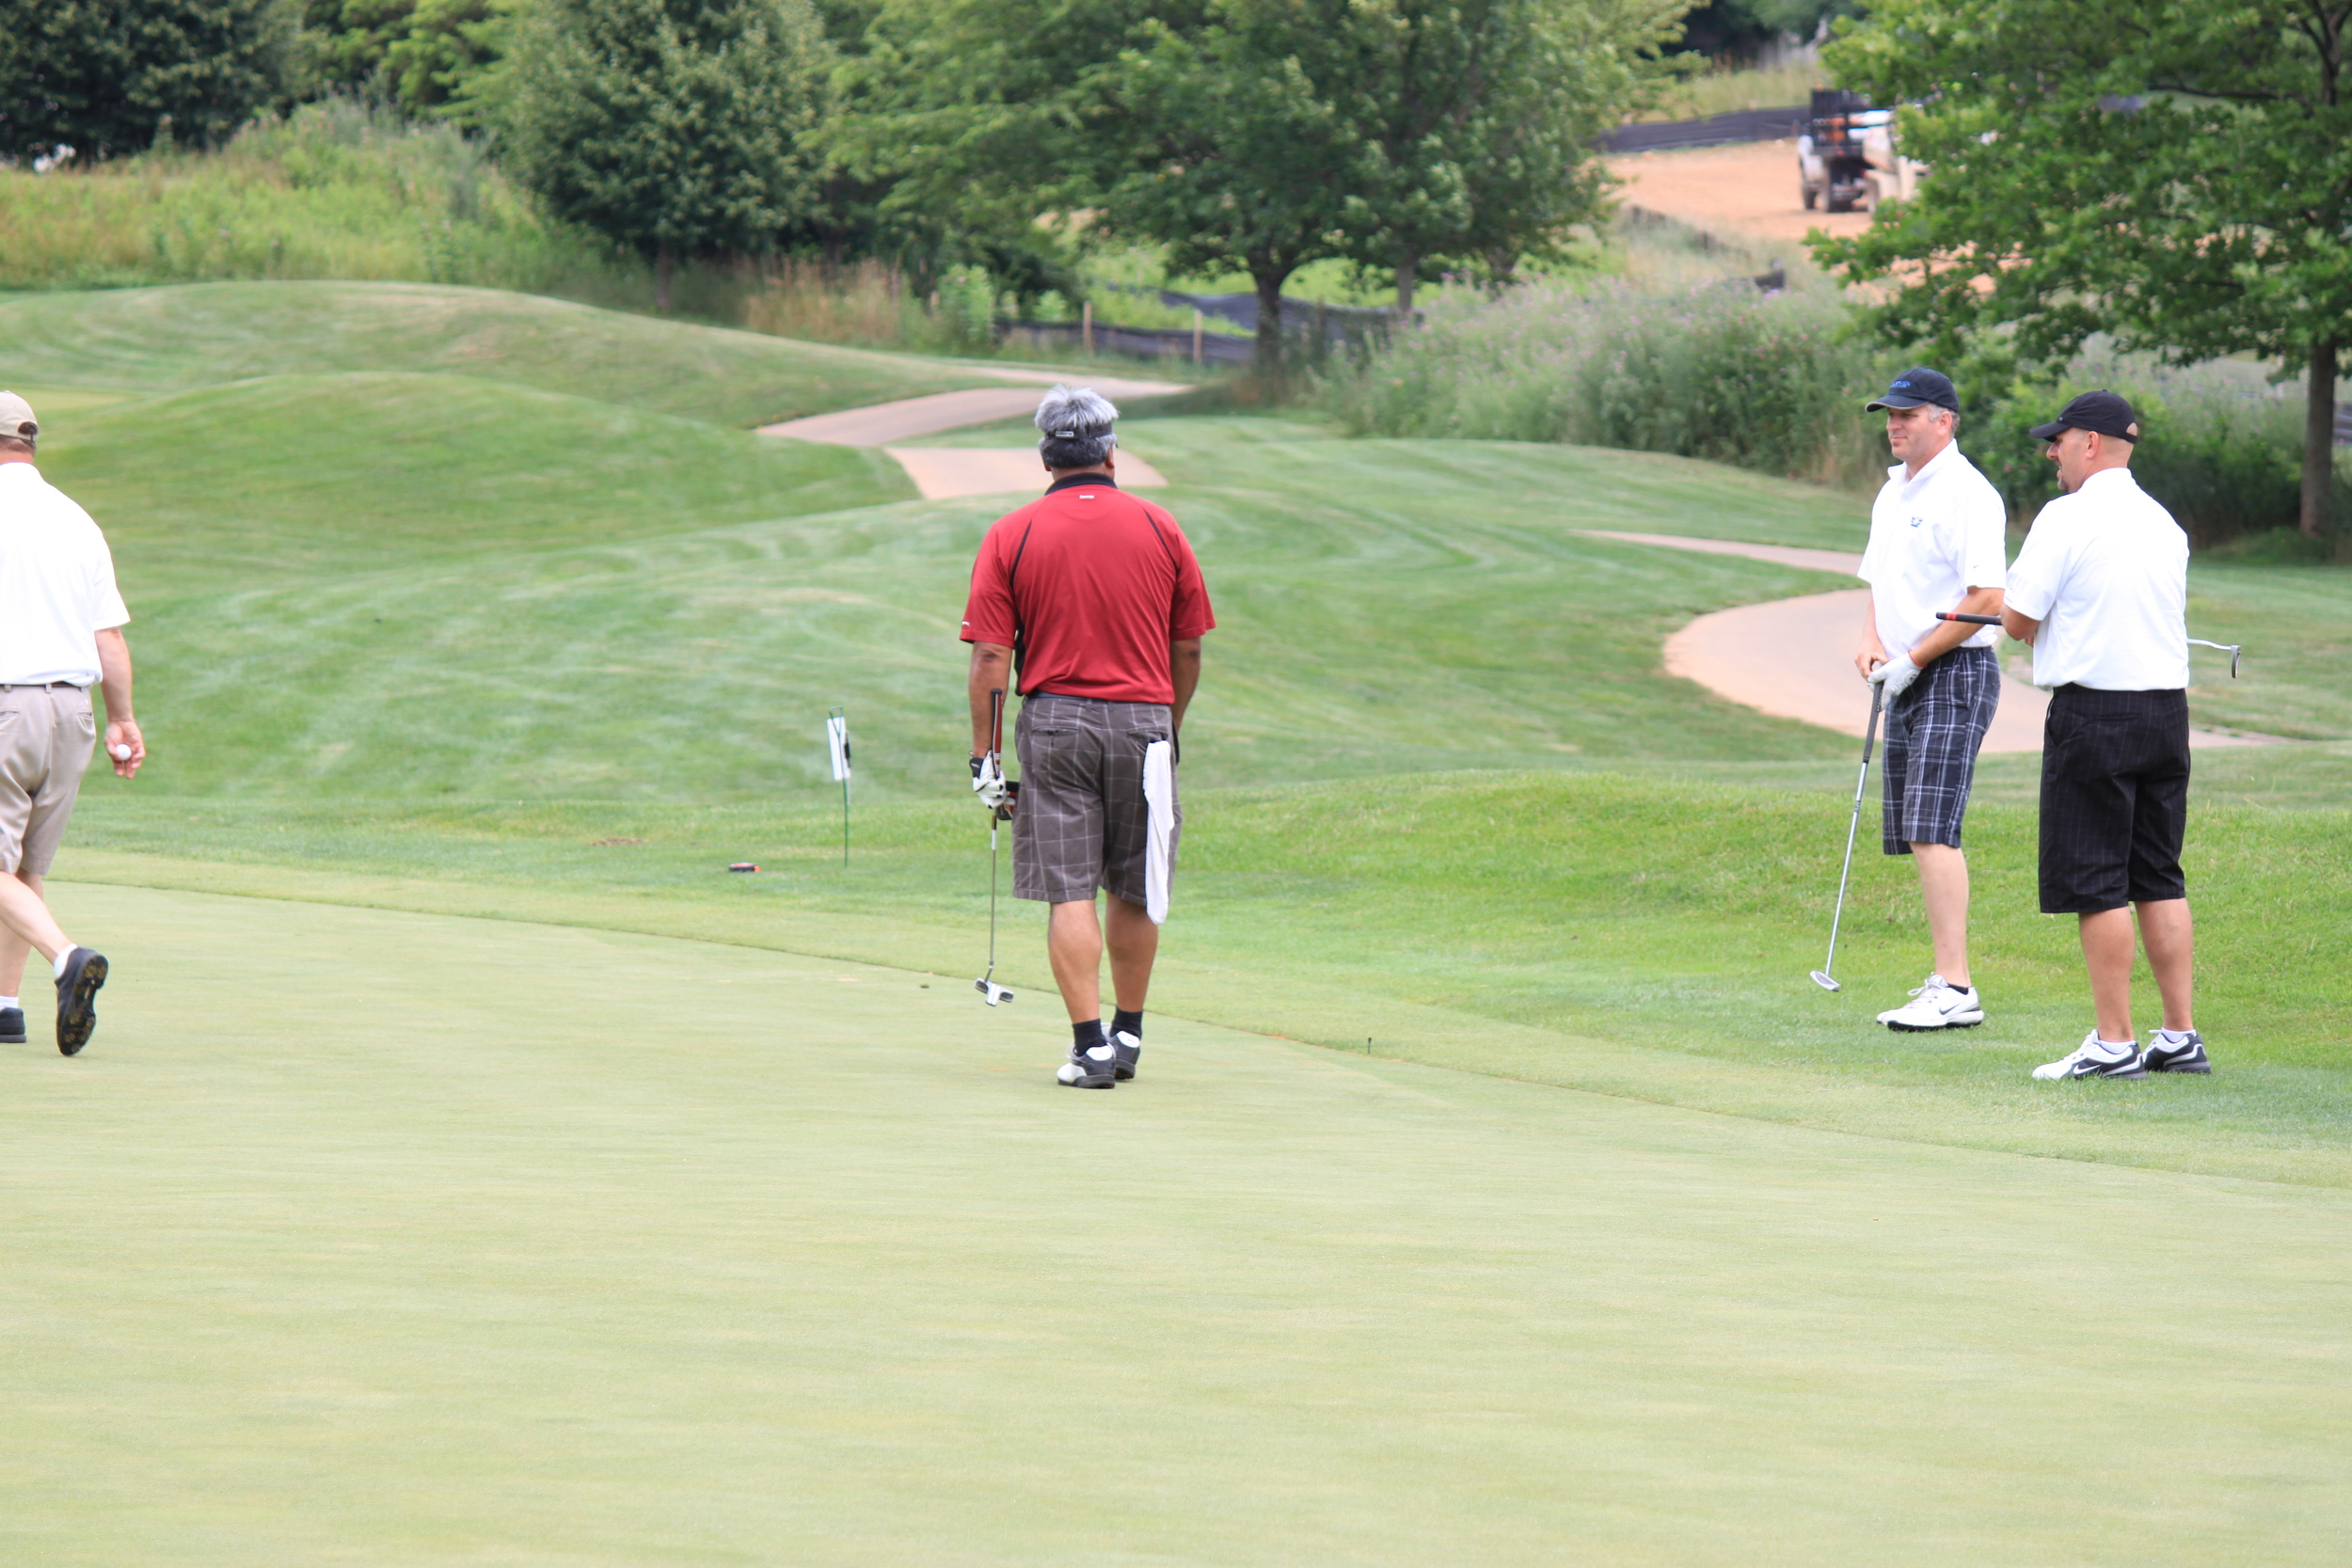 Dennis_Fitzgerald_Golf_Tournament_2011_IMG_3729.JPG